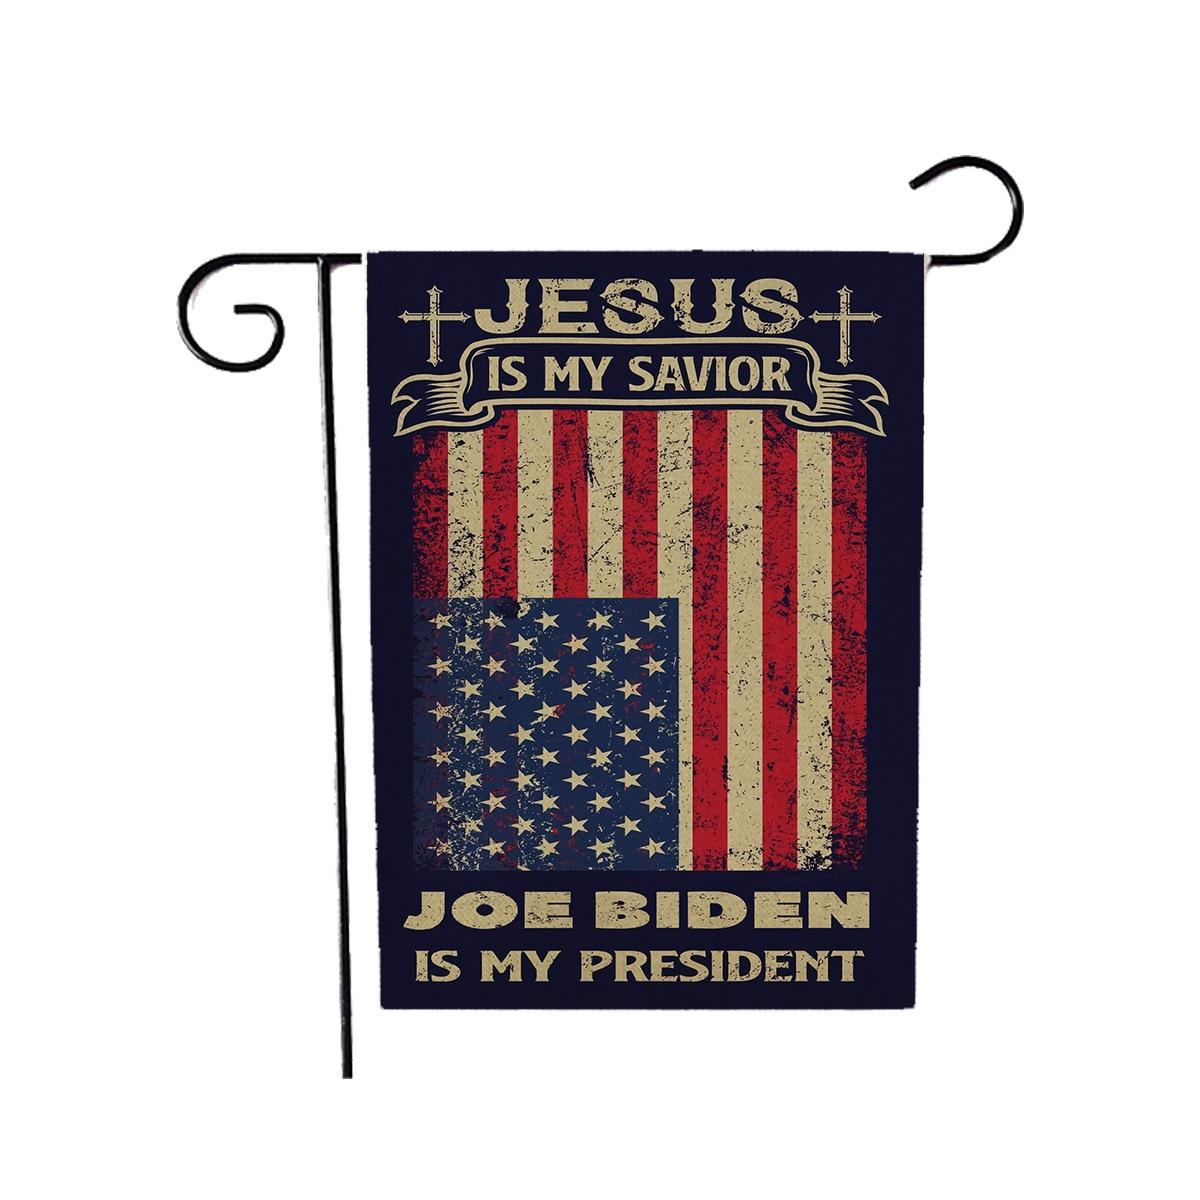 Biden Mantenha América Grande Banners 45 * 30cm 8 cores decor Bandeira Bandeira Biden suspensão Imprimir 3X5Ft Digital Donald Biden 2020 Bandeira Bh2022 Tqq # 692